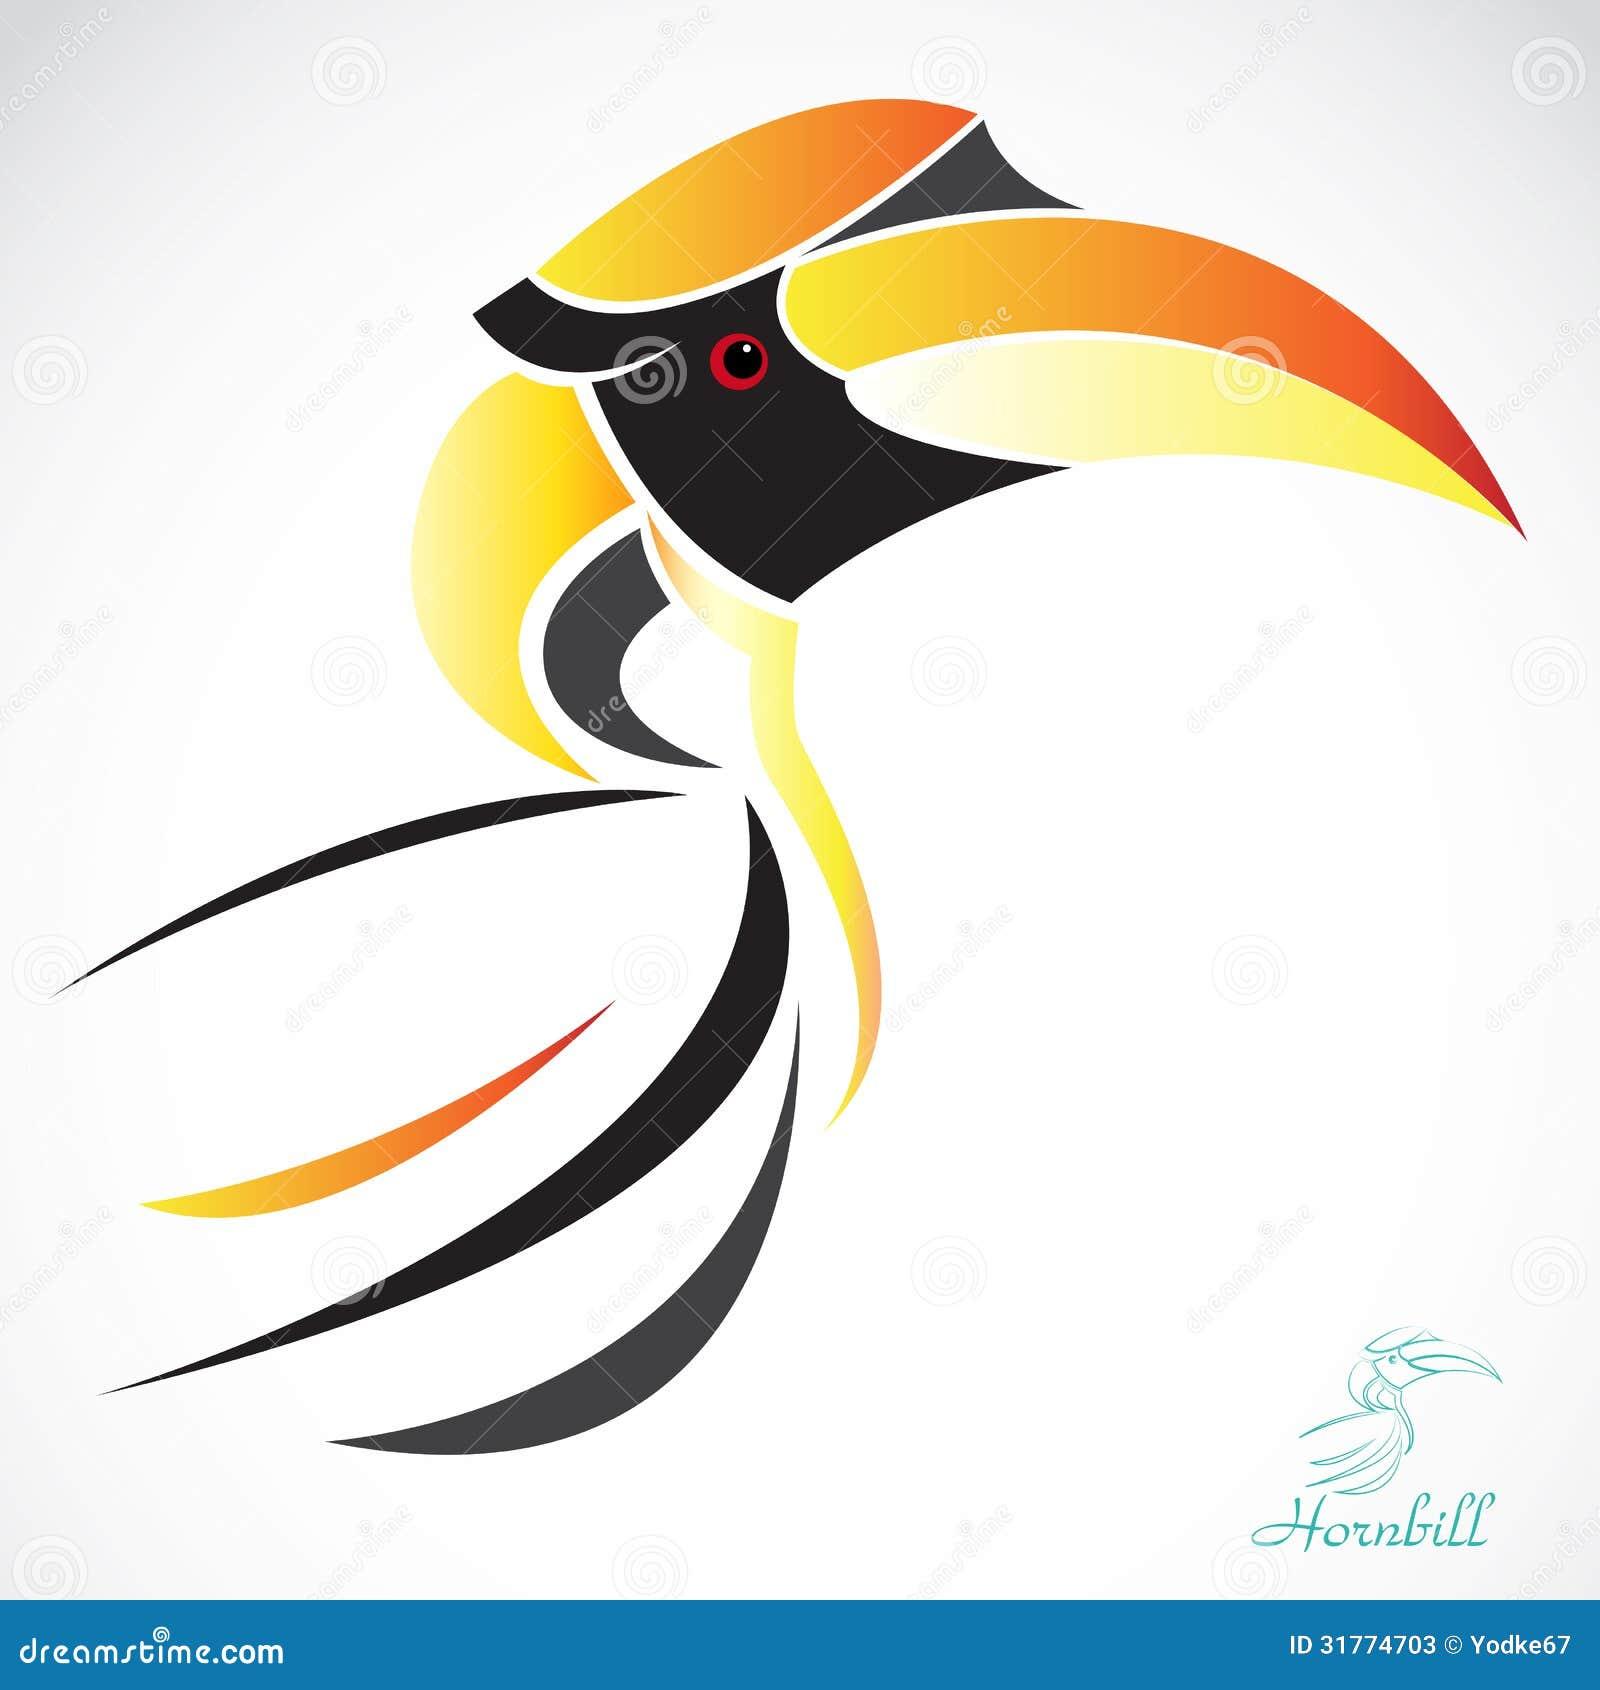 Vector Image Of An Hornbill Stock Photos Image 31774703